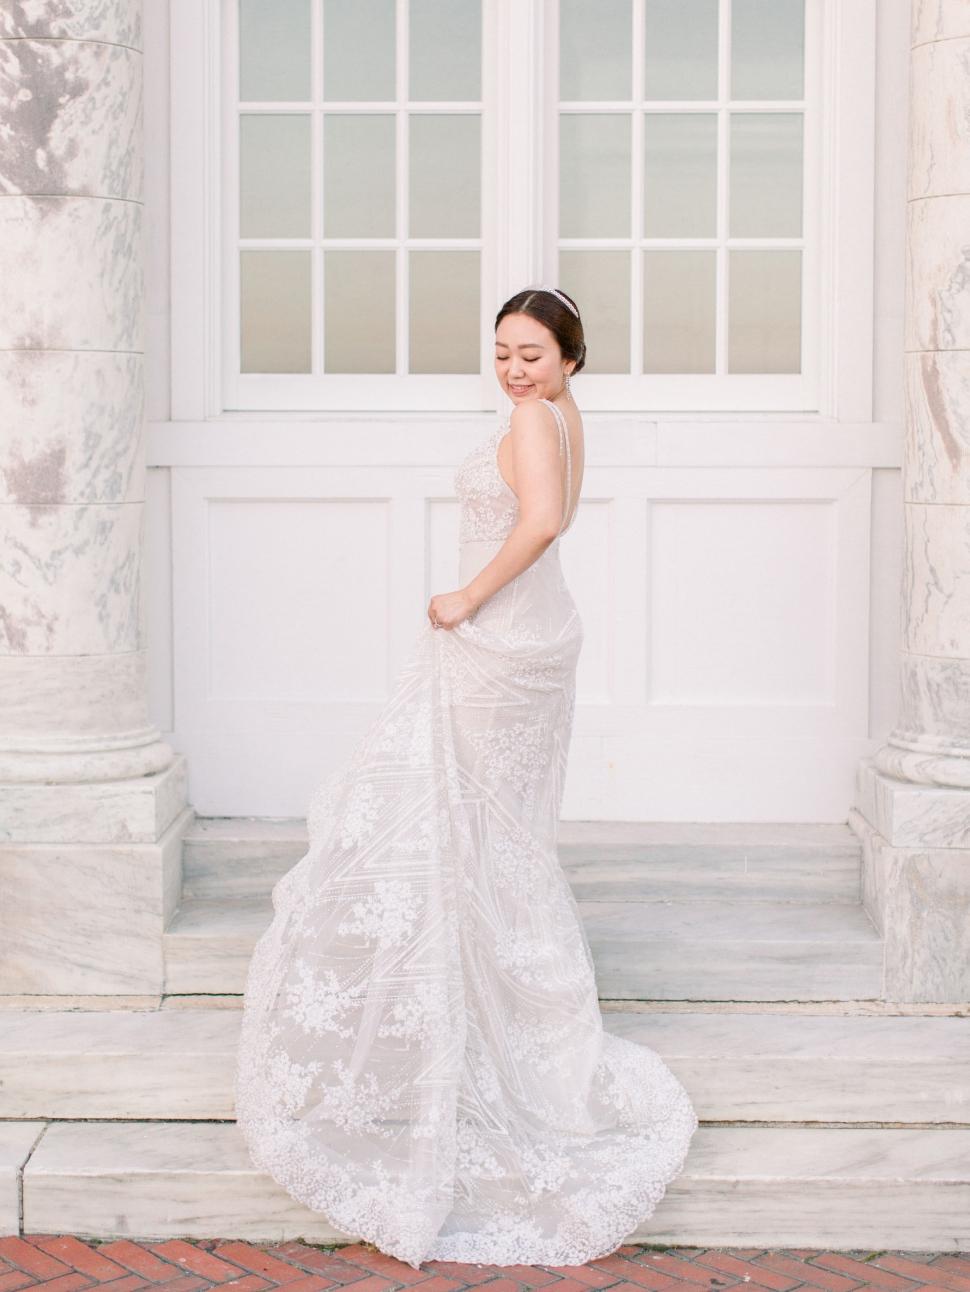 Bourne-Mansion-Wedding-Photos-Cassi-Claire-Long-Island-Wedding-Photographer_35.jpg